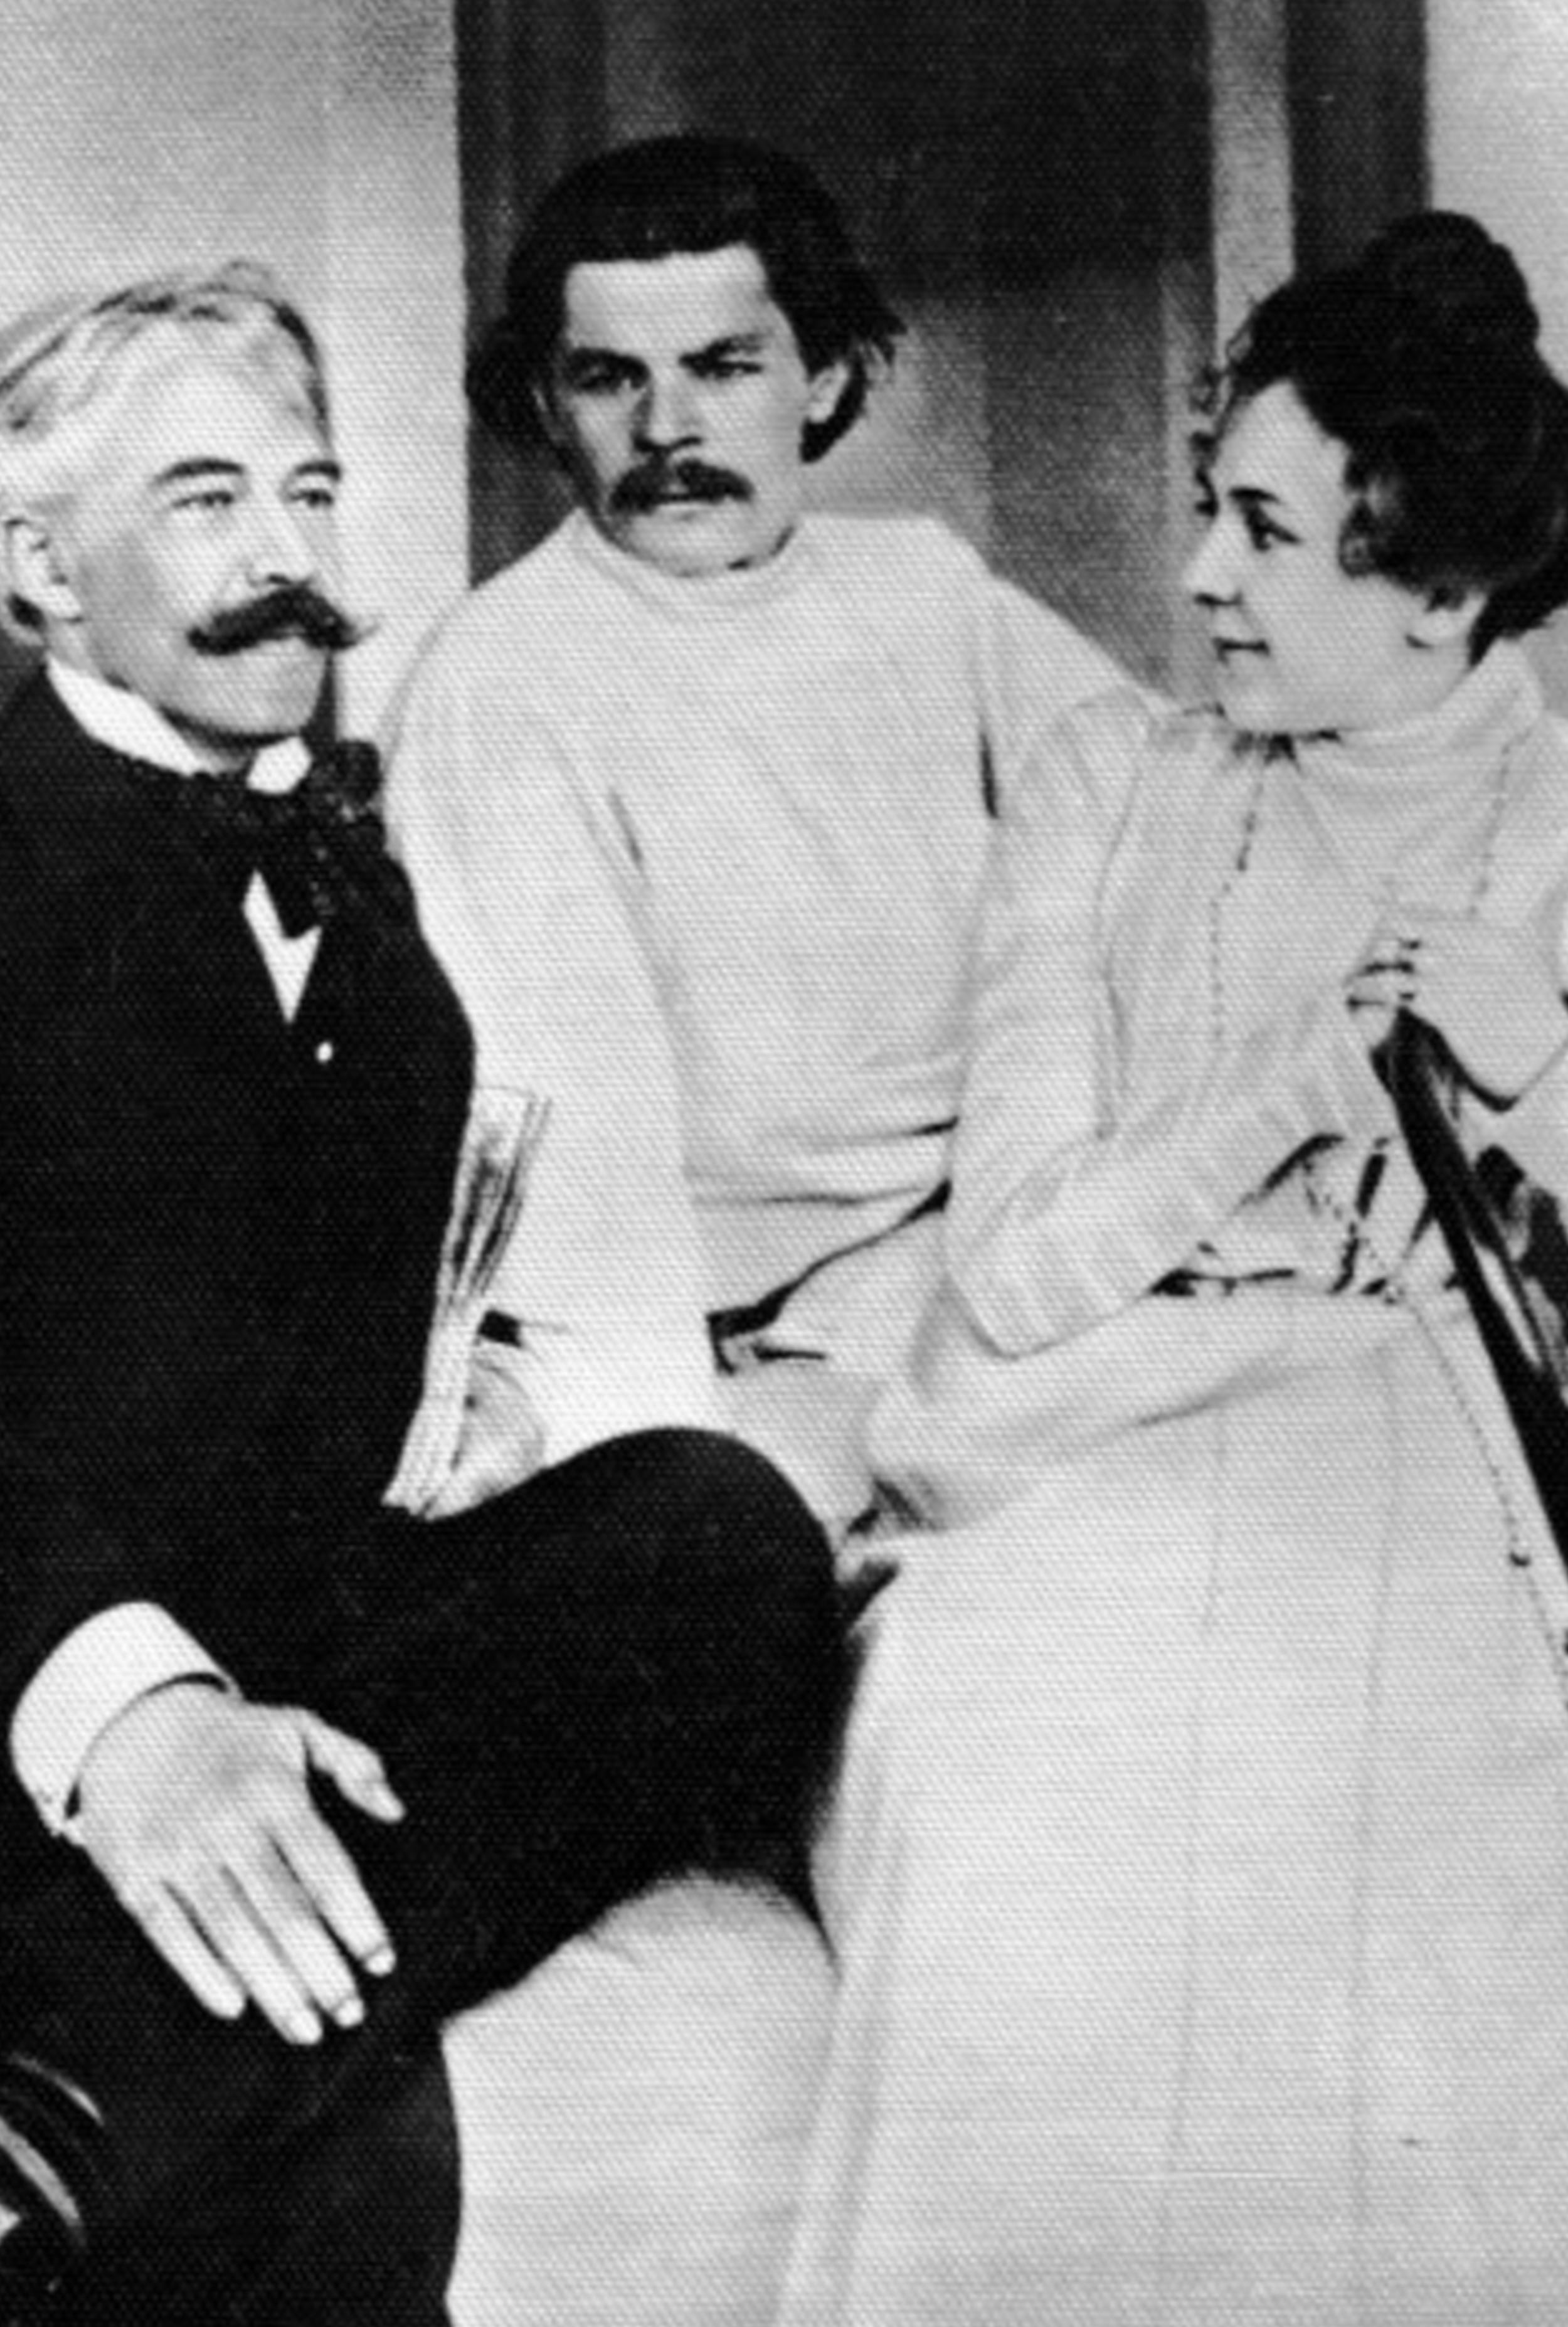 Stanislavski with Maxim Gorky and Lilina (Stanislavsky's wife)